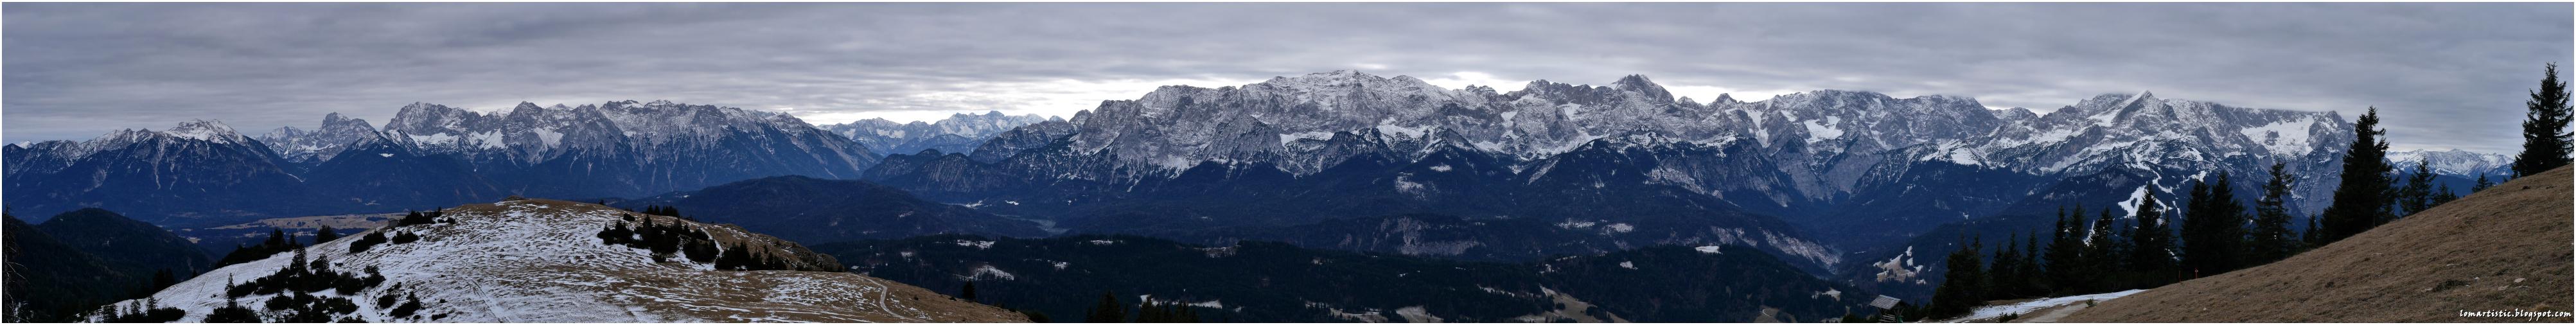 Bavarian mountains